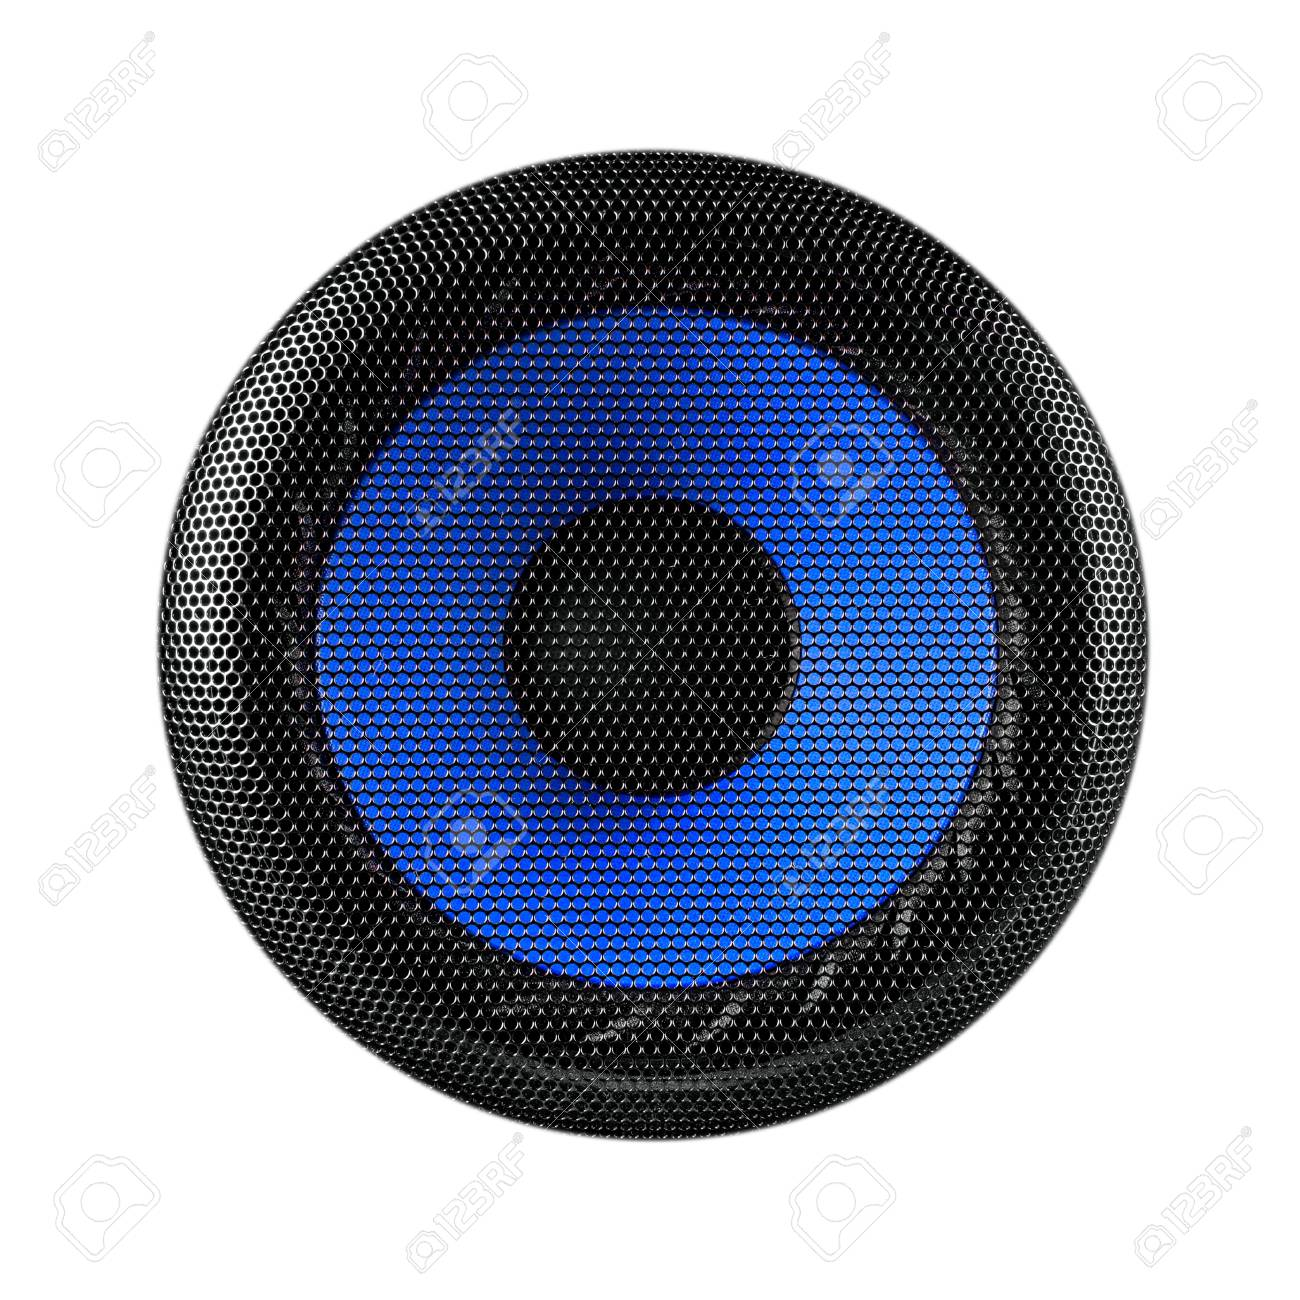 Blue and black speaker sub woofer isolated on white Stock Photo - 27064434